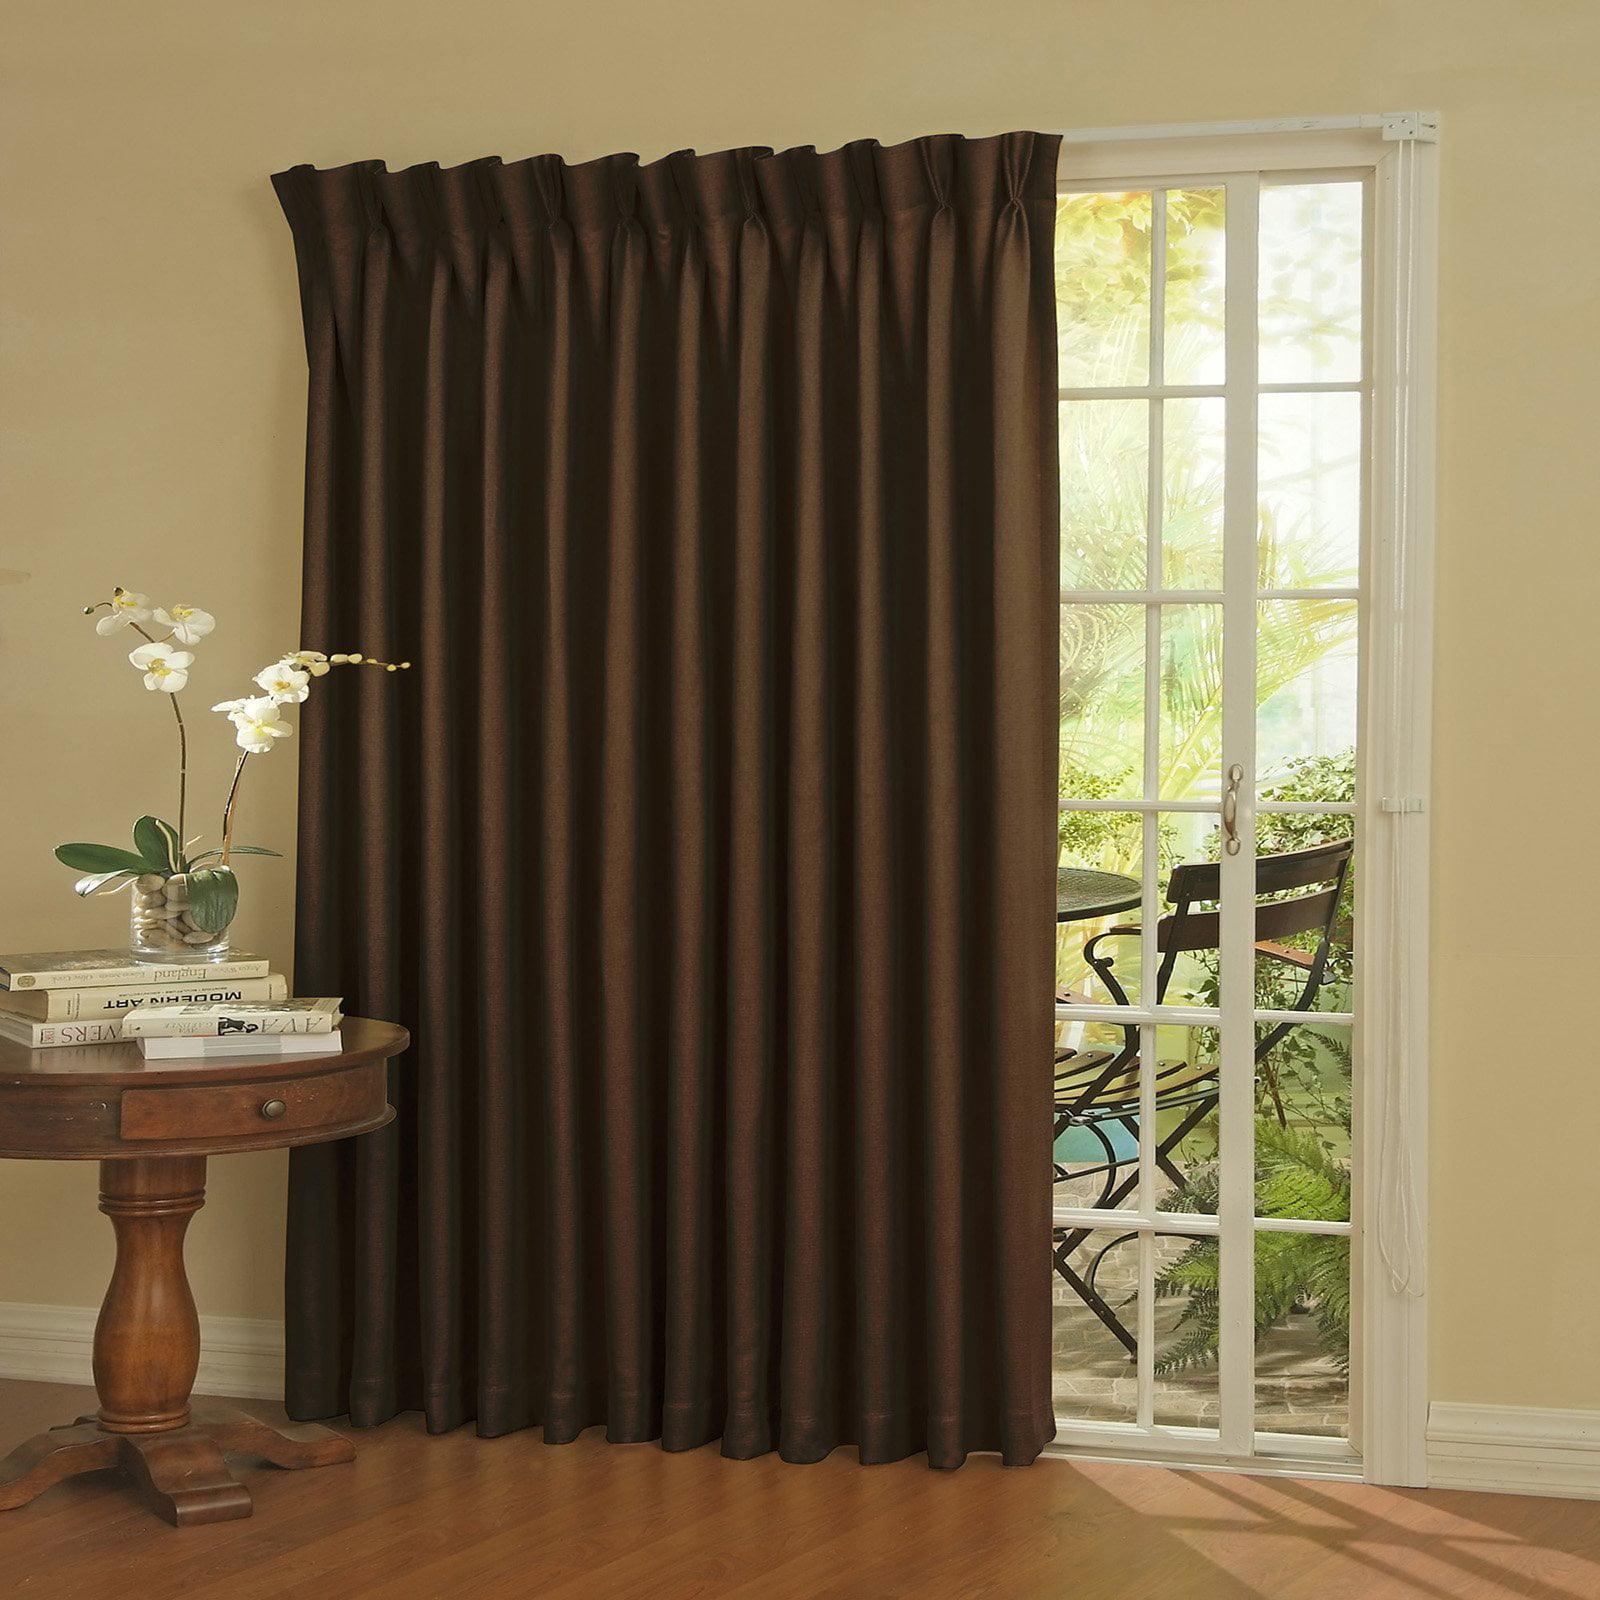 Eclipse Thermal Blackout Patio Door Curtain Panel Walmart